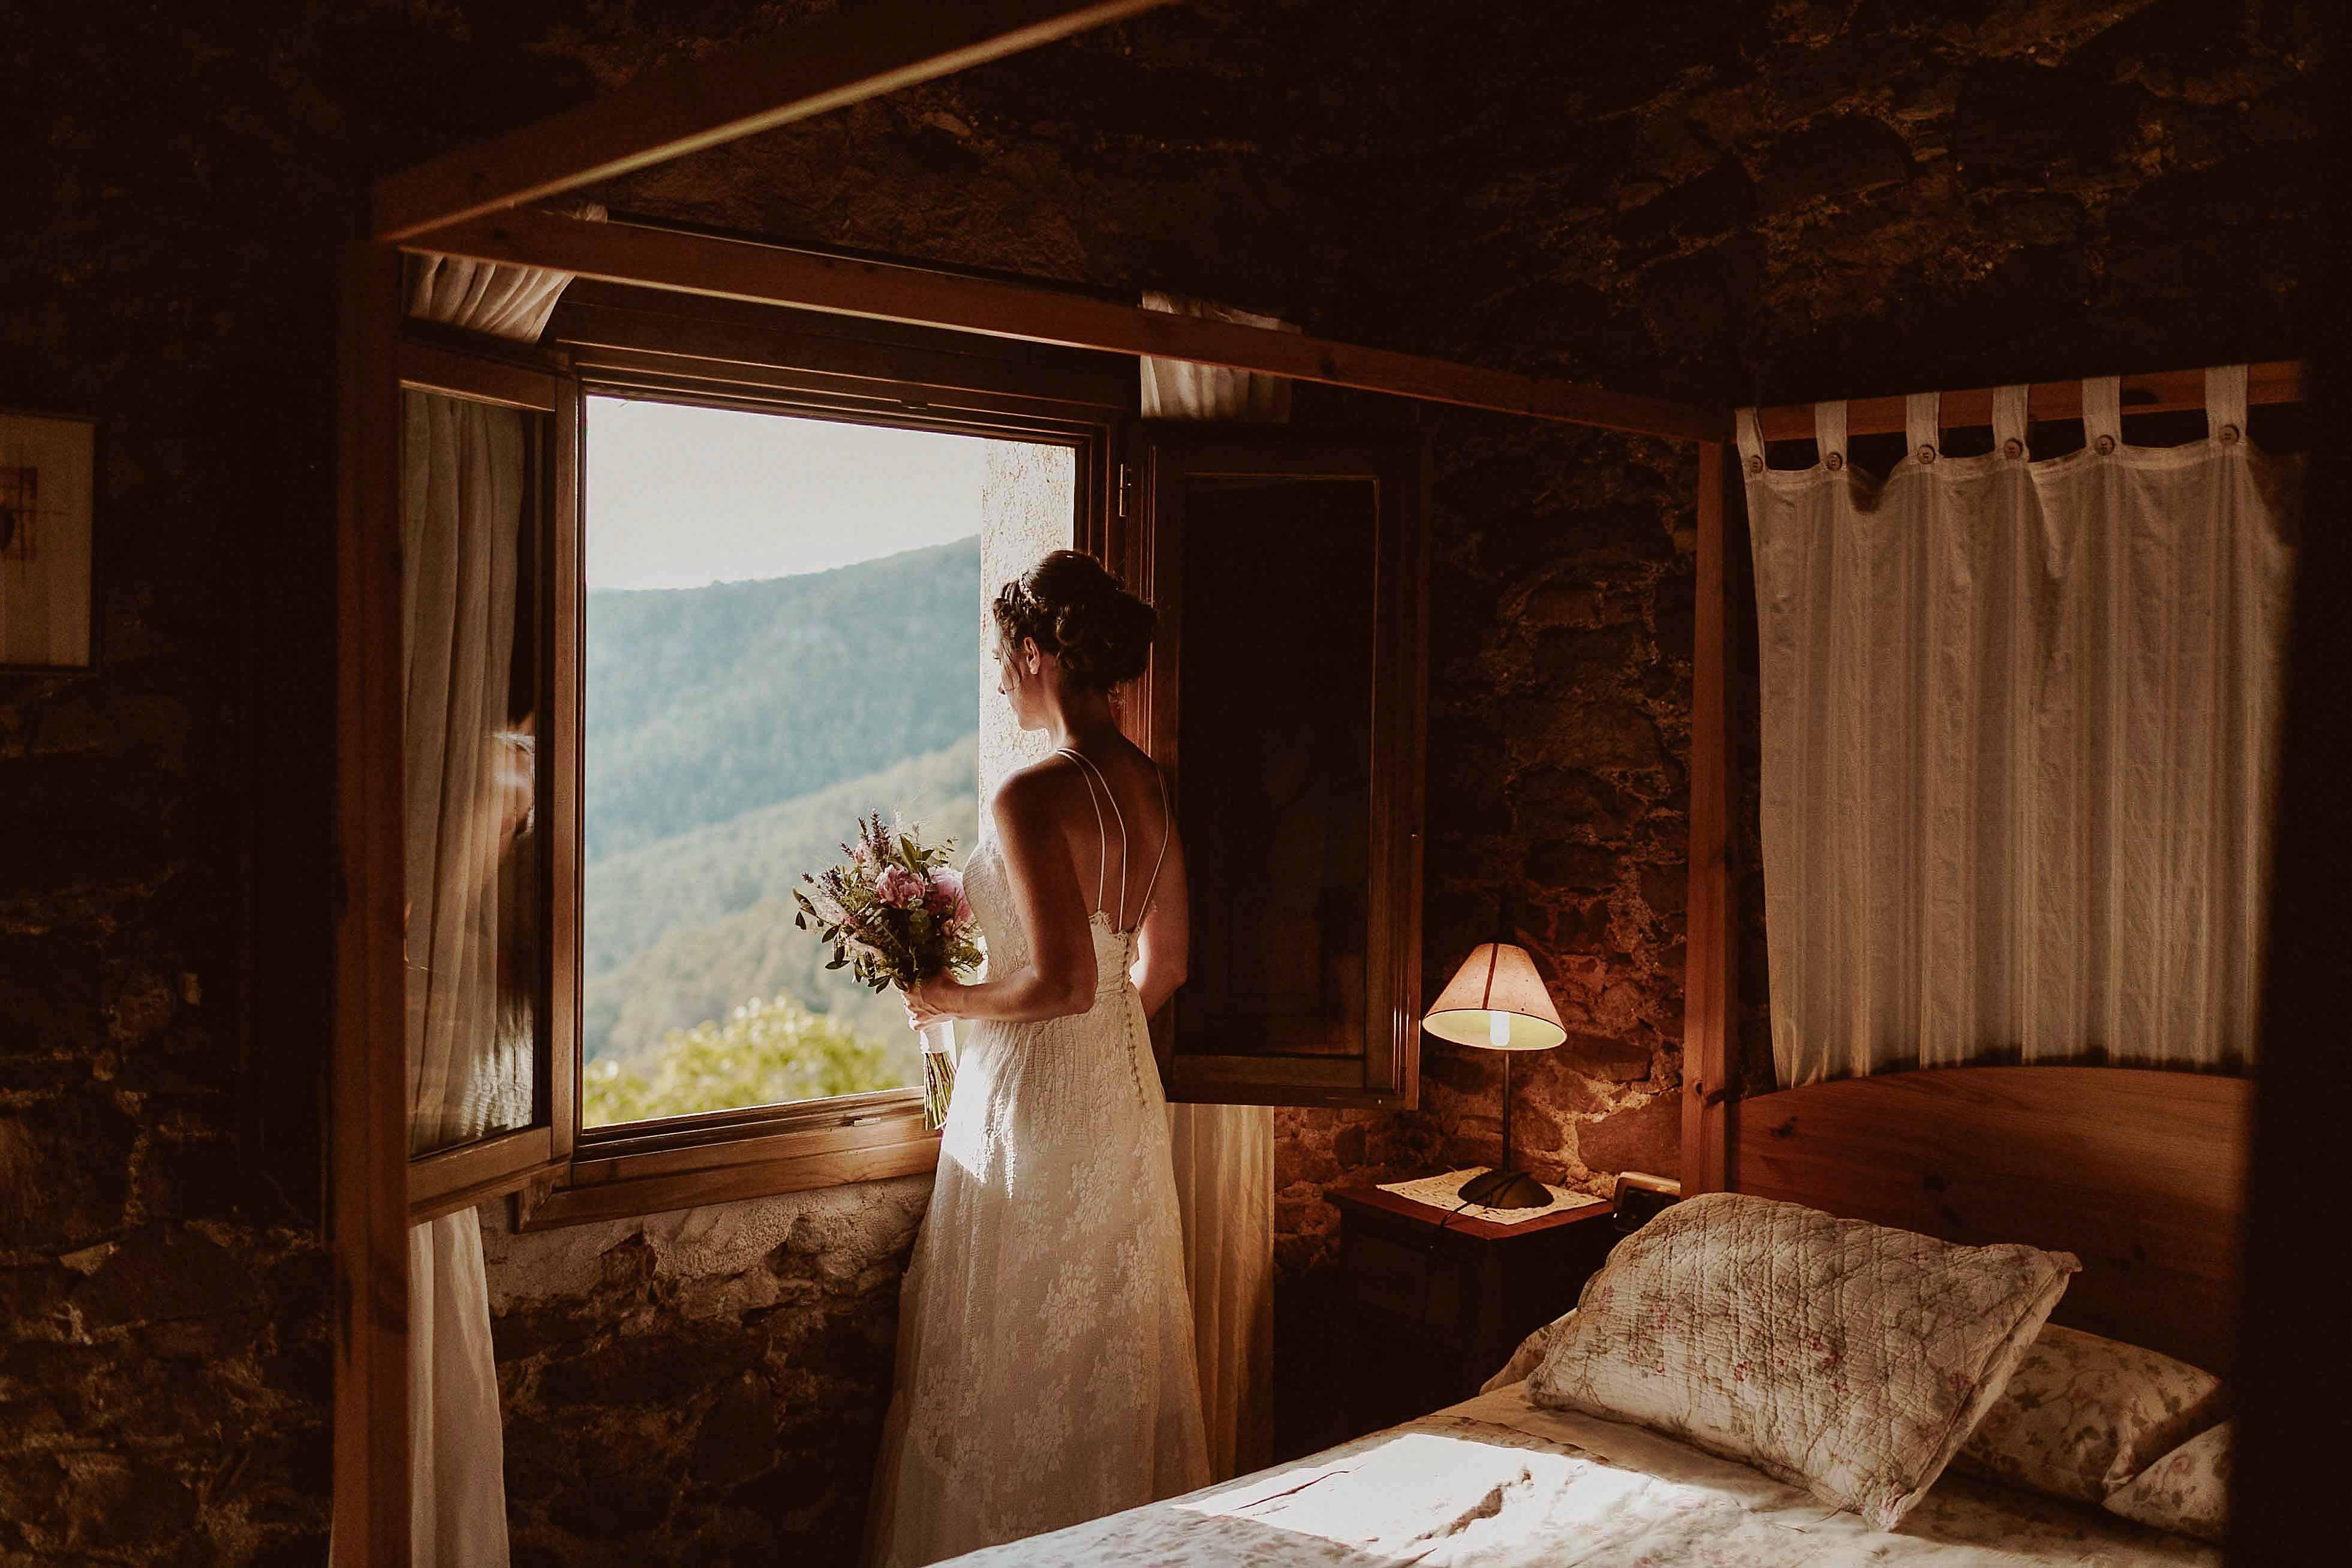 Boda rústica en la montaña. fotgrafo de bodas barcelona_044